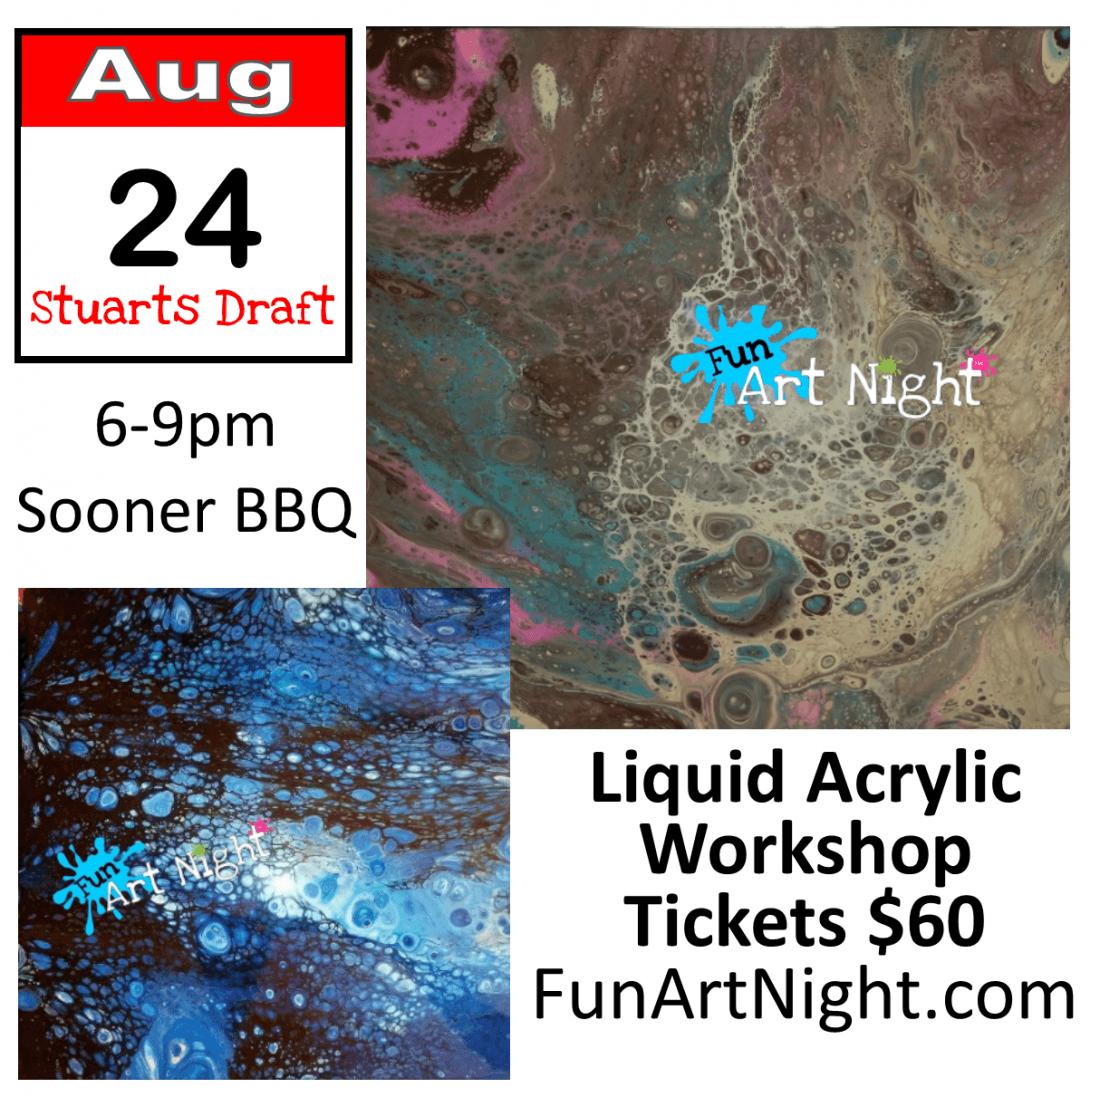 Liquid Acrylic Workshop